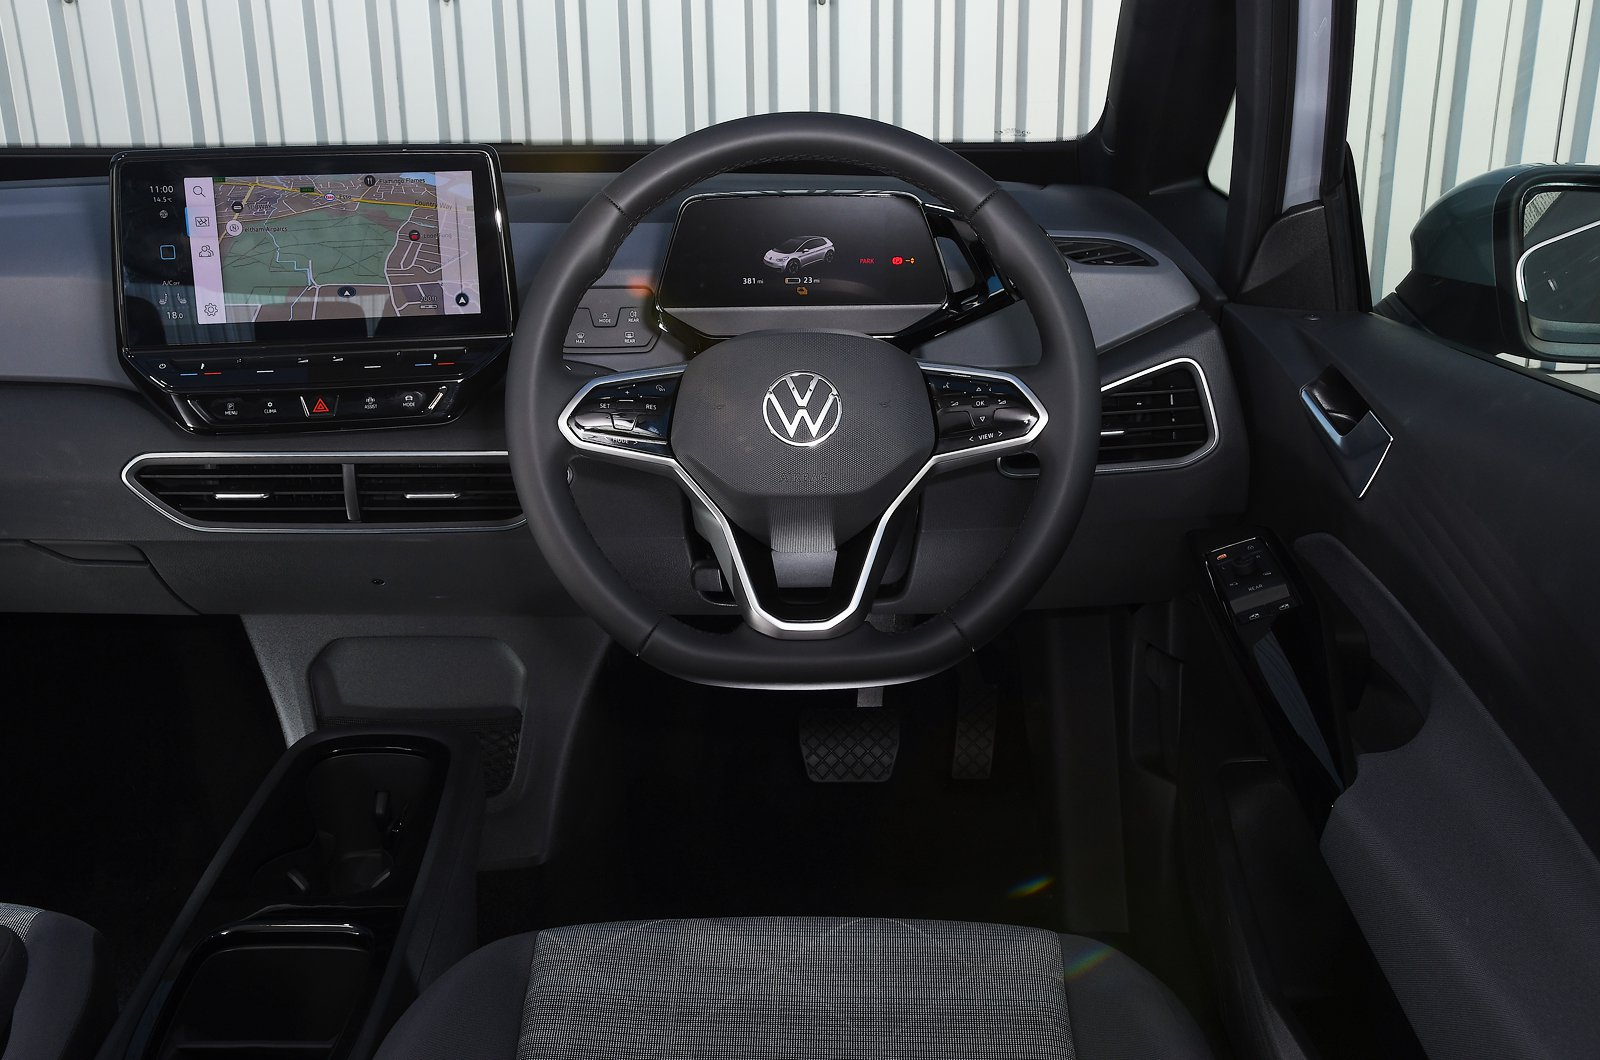 Volkswagen ID.3 dashboard